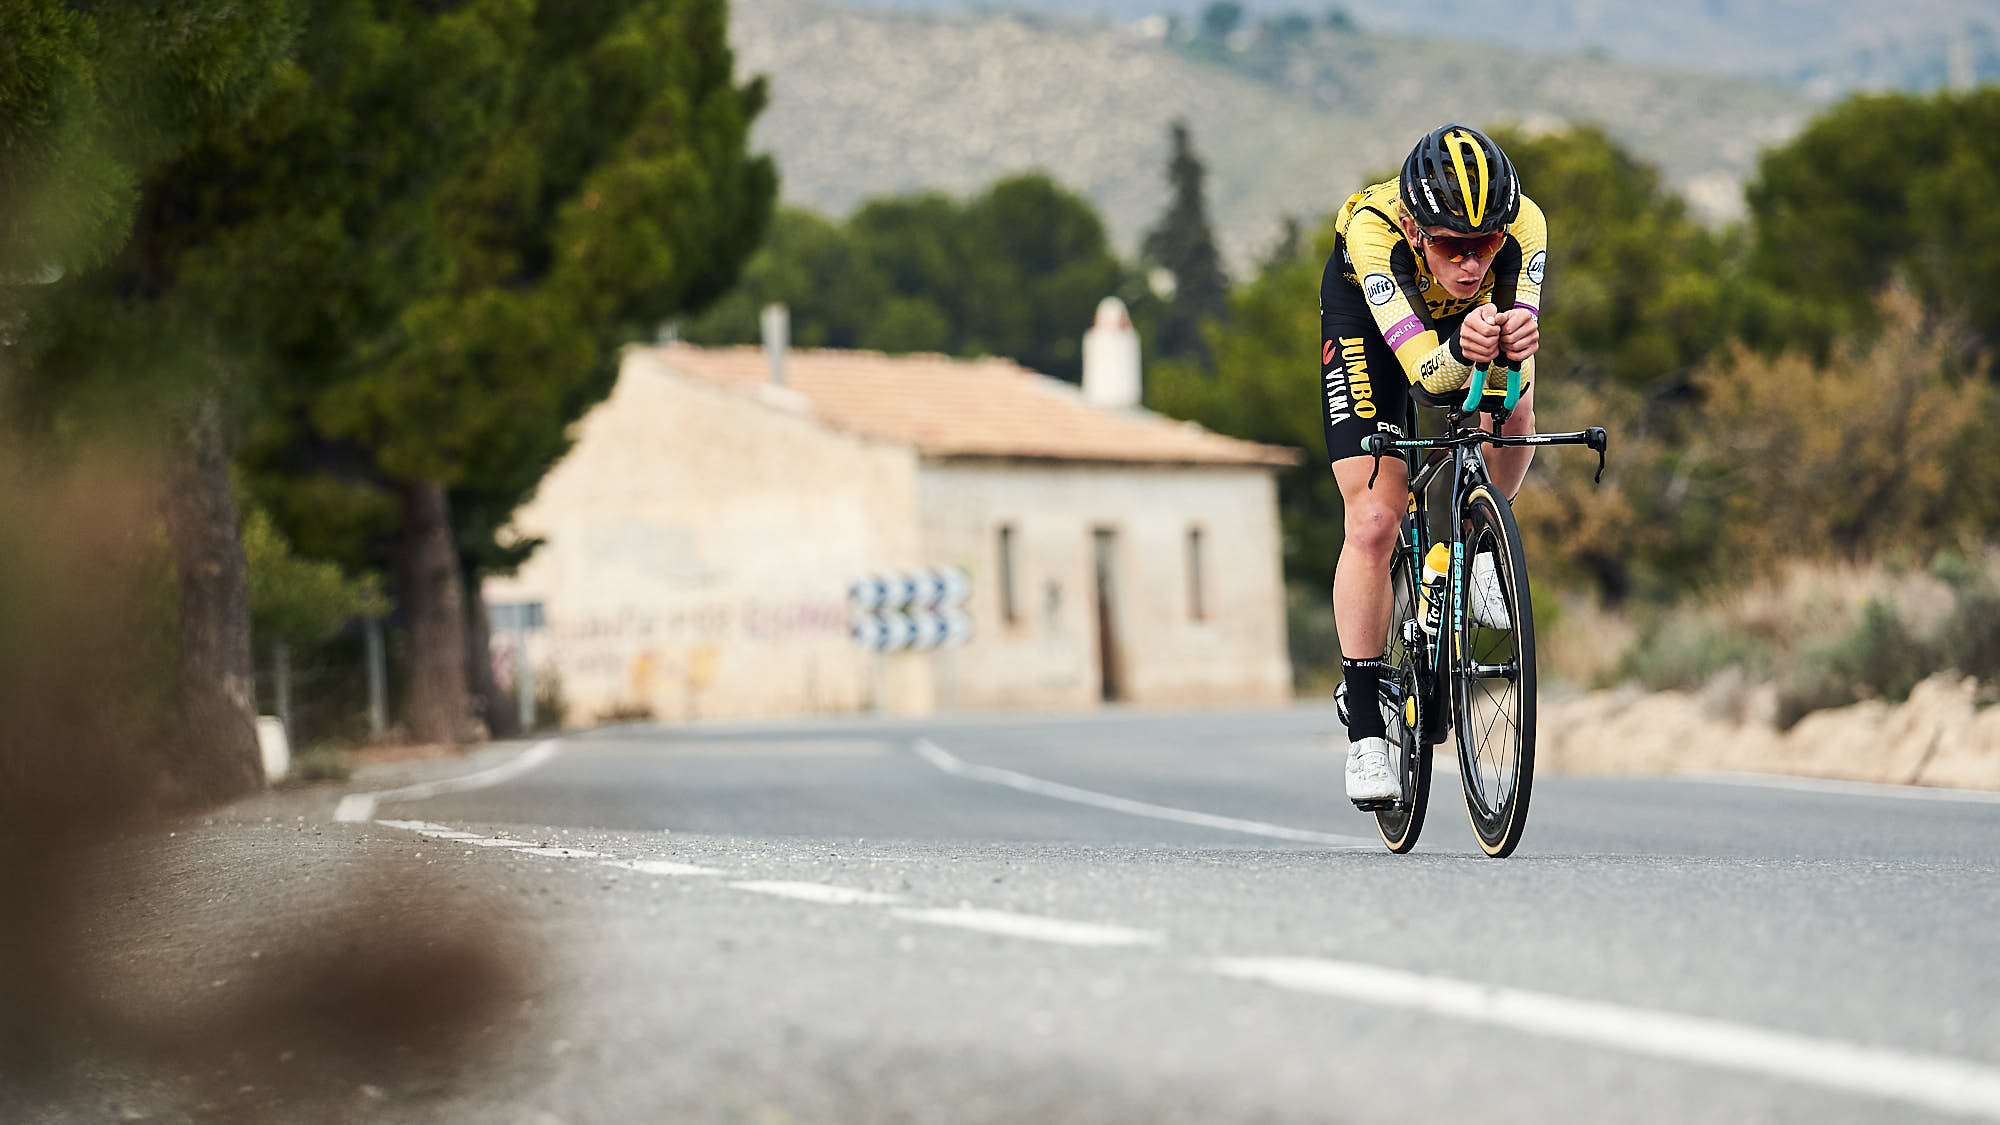 Team Jumbo-Visma rider Koen Bouwman on a Bianchi time trial bike